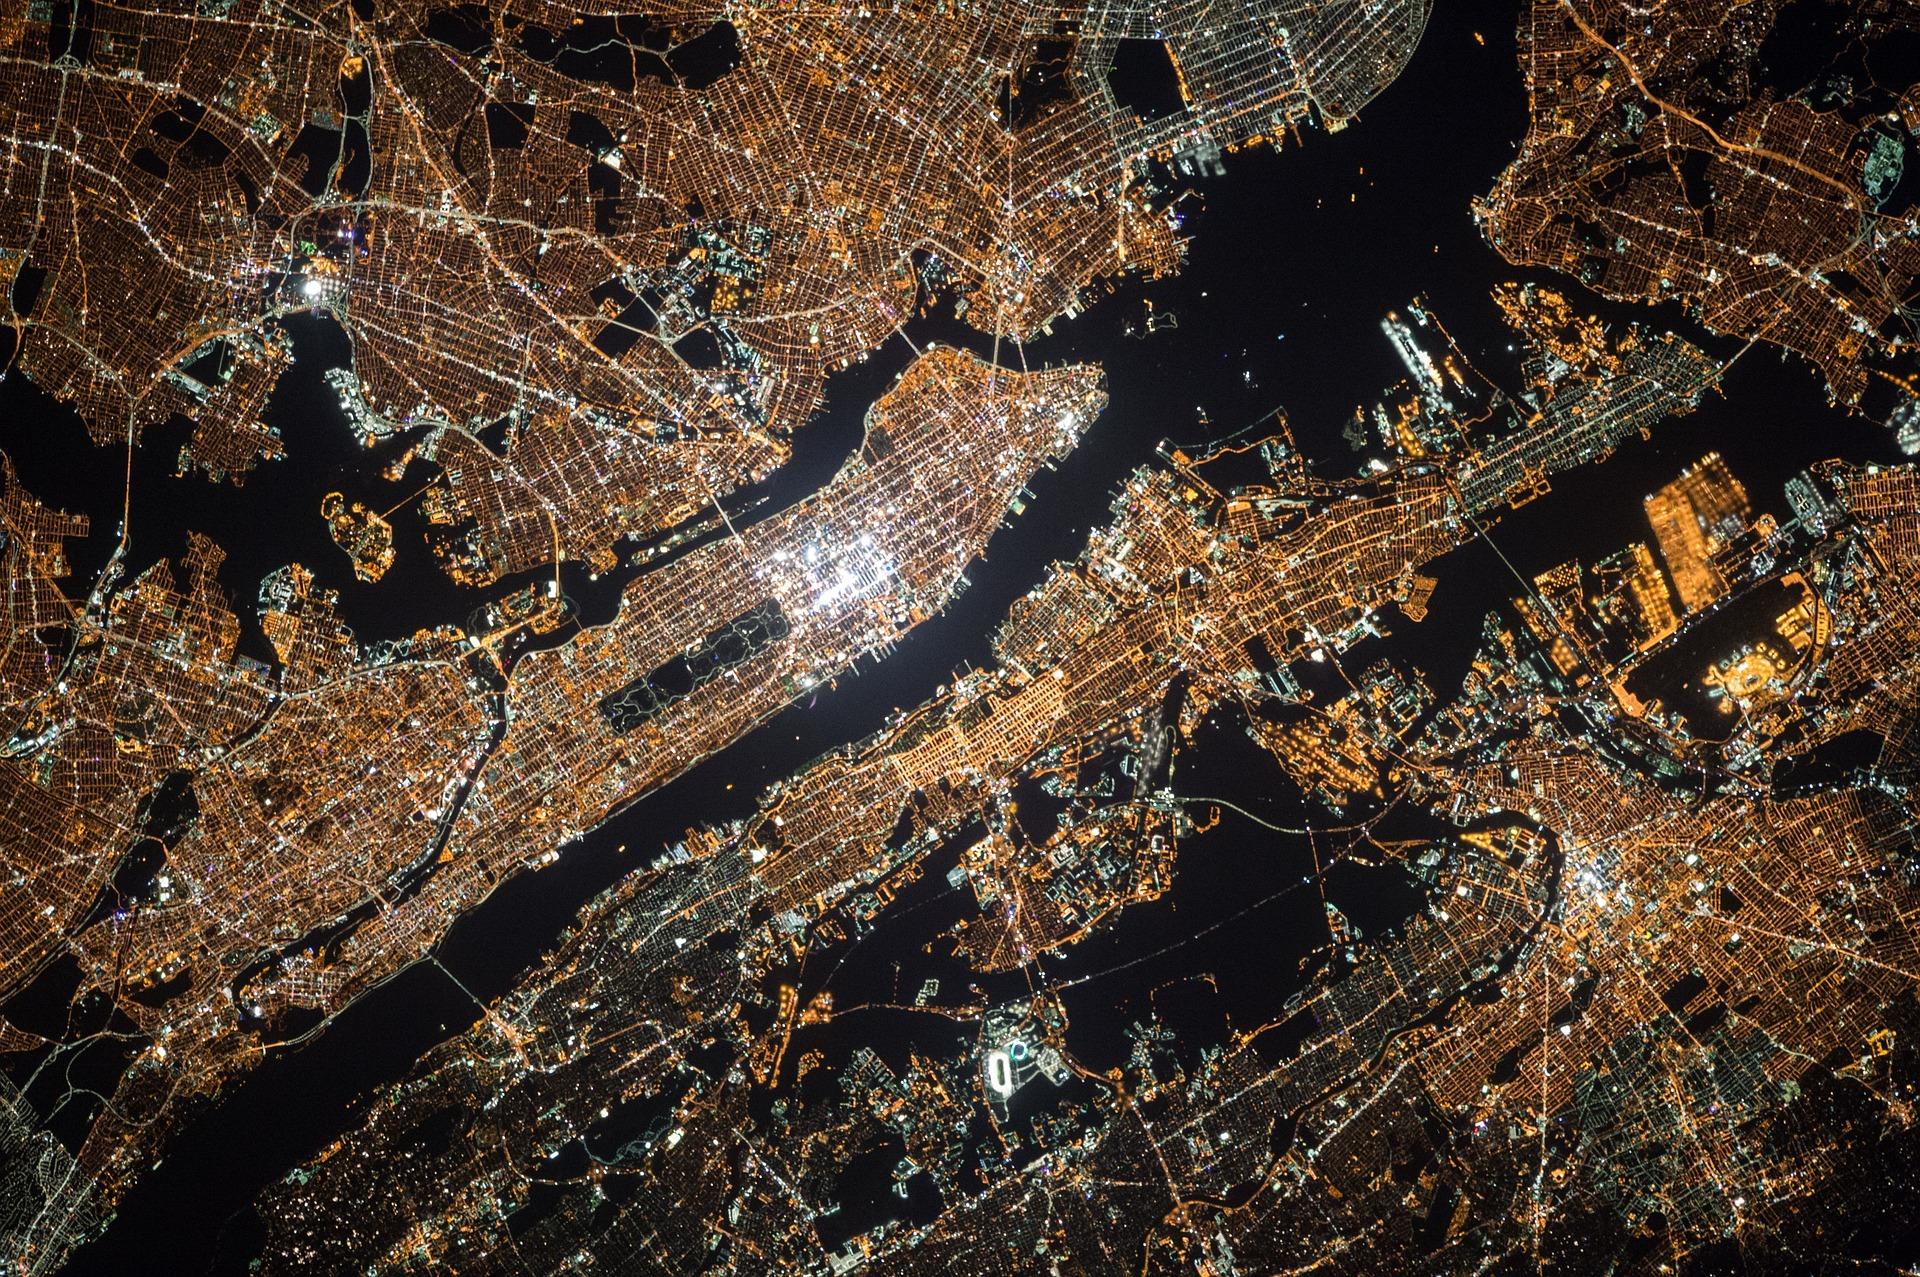 new-york-city-1030778_1920.jpg